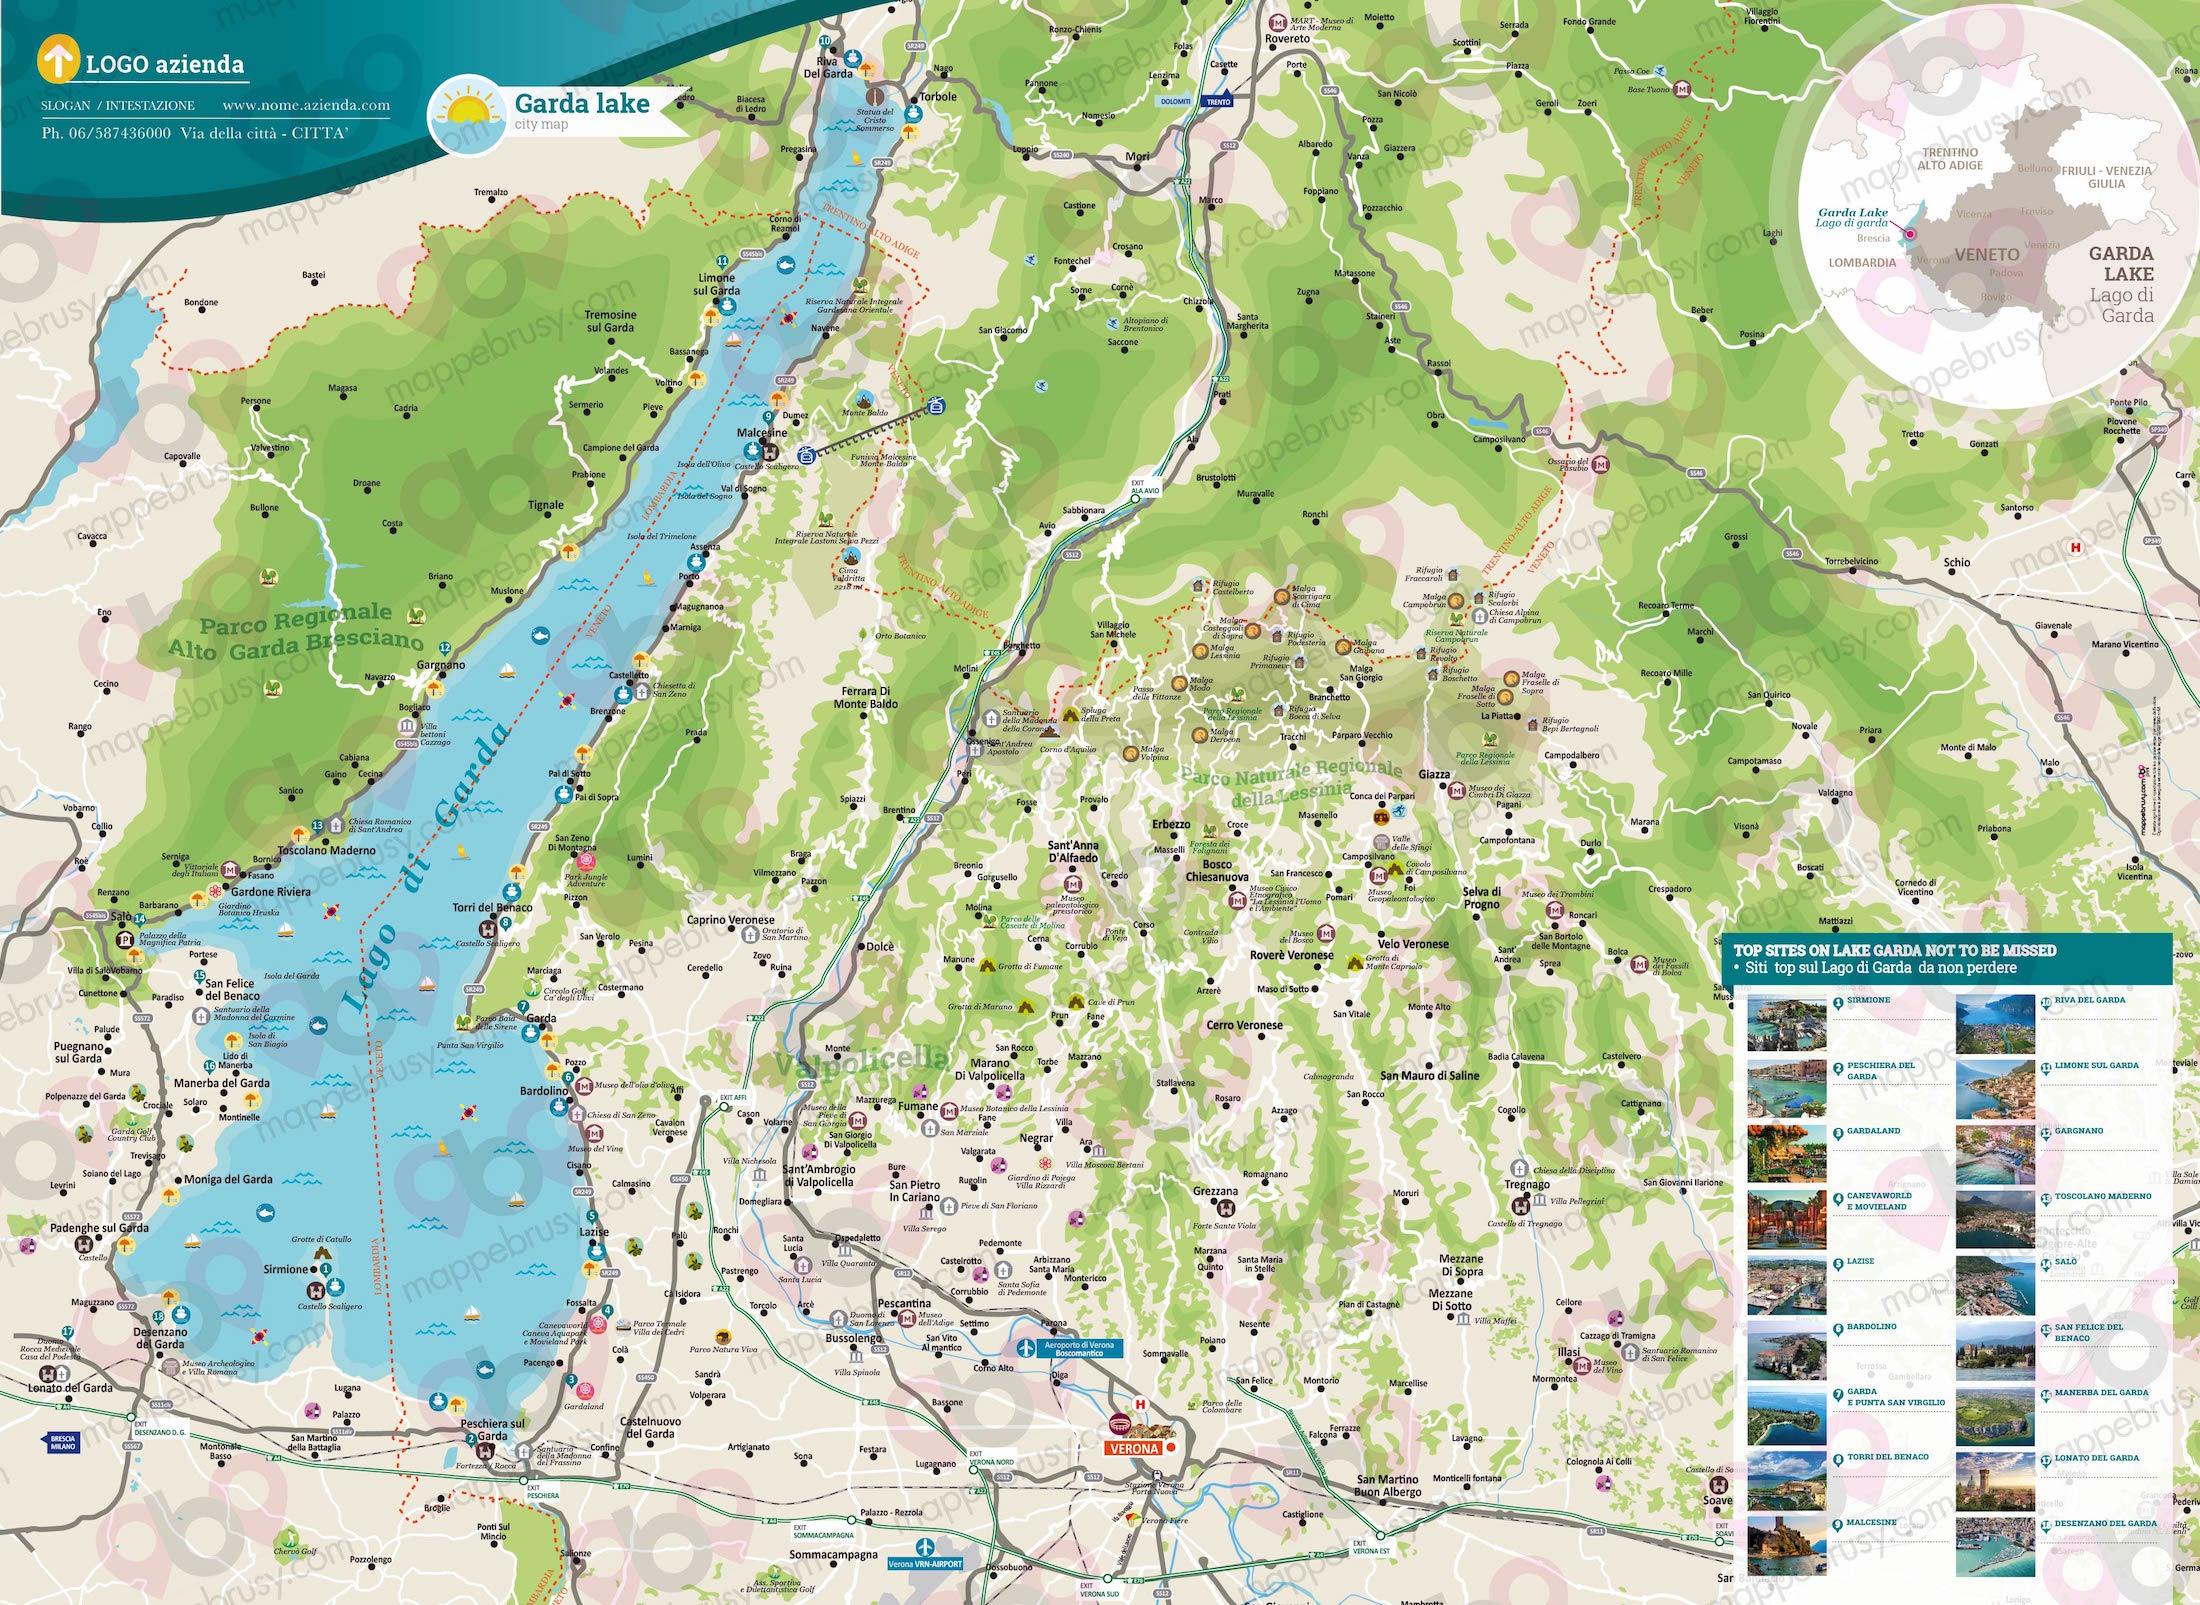 Cartina Stradale Lago Di Garda.Lago Di Garda Mappe Brusy